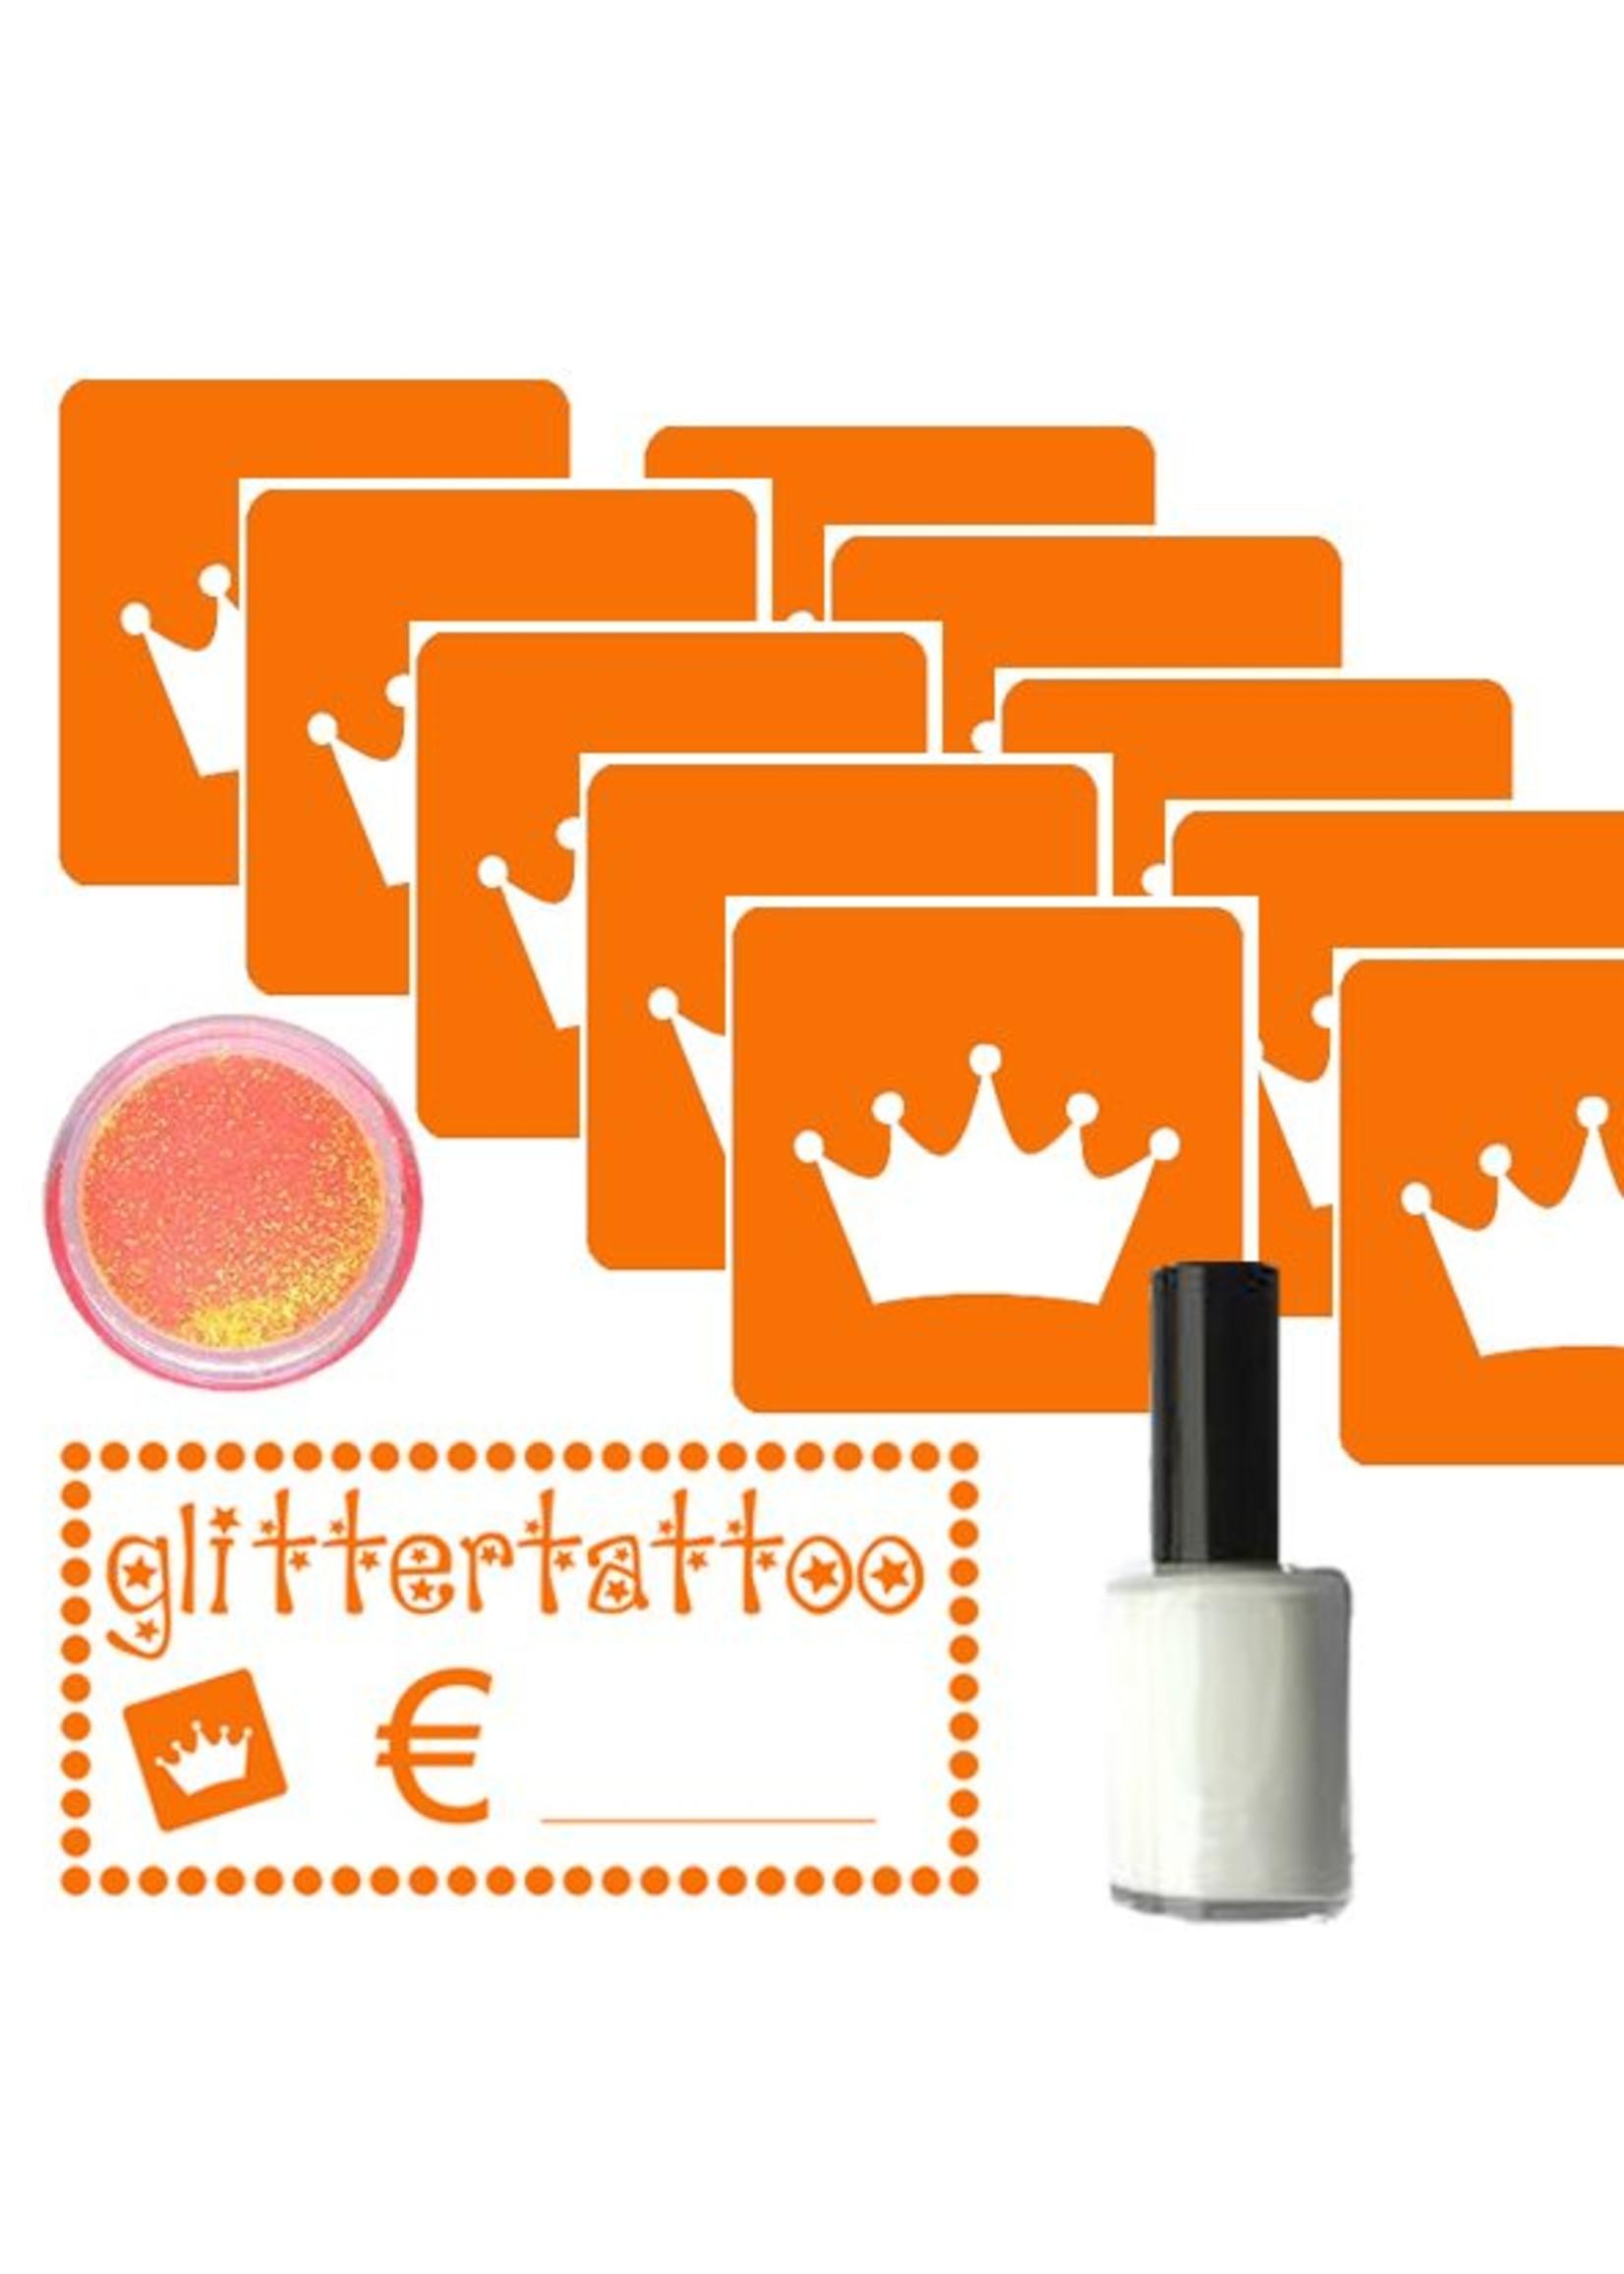 Glittertattoo set - Koningsdag met 10 sjablonen, huidlijm, opzetkaartje en oranje glitters